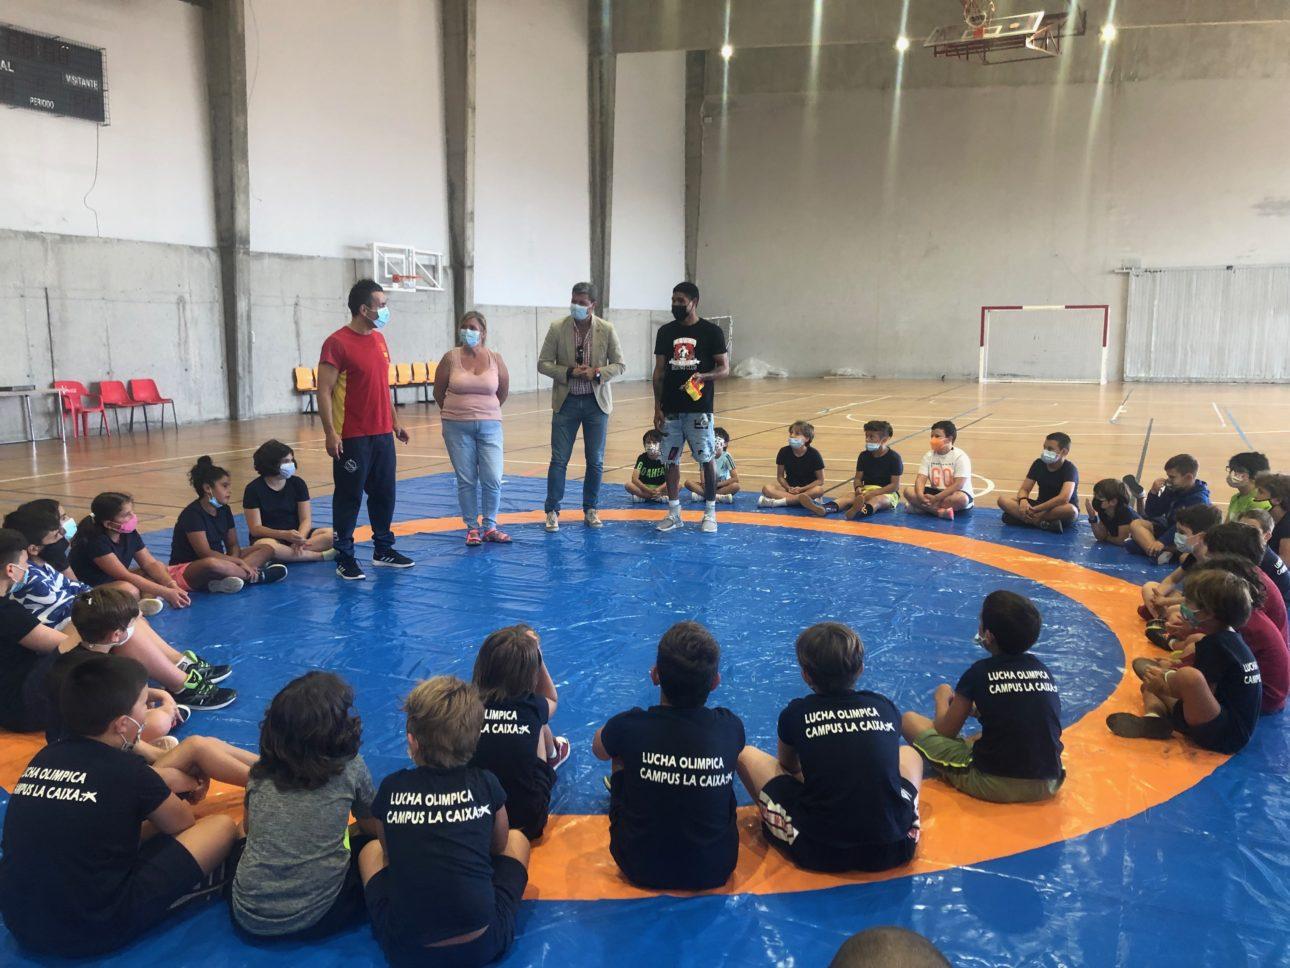 Campus Lucha Olimpica scaled Baiona